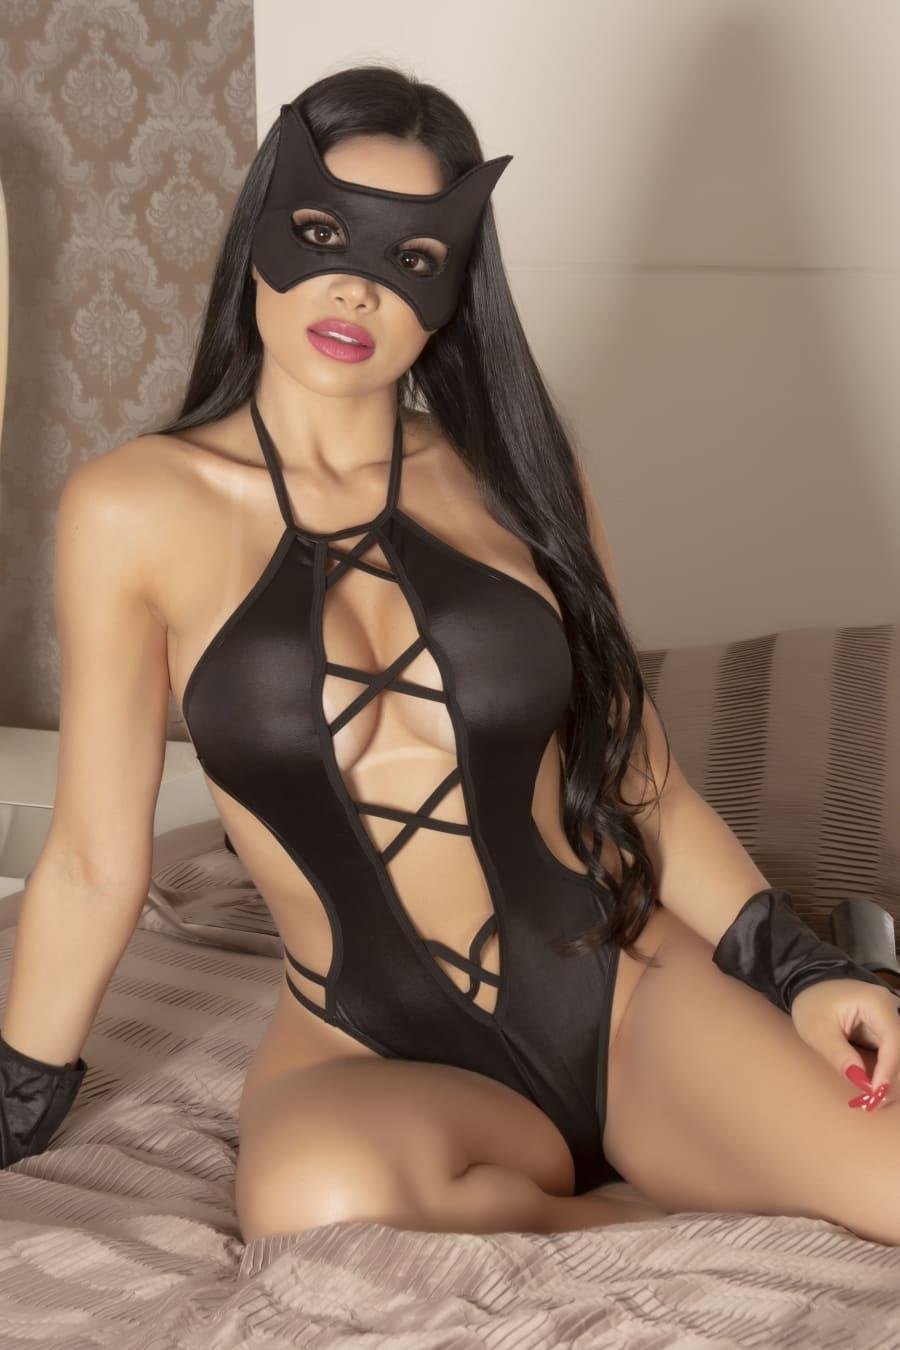 Fantasia mulher aranha - BODY,LUVAS E MASCARA